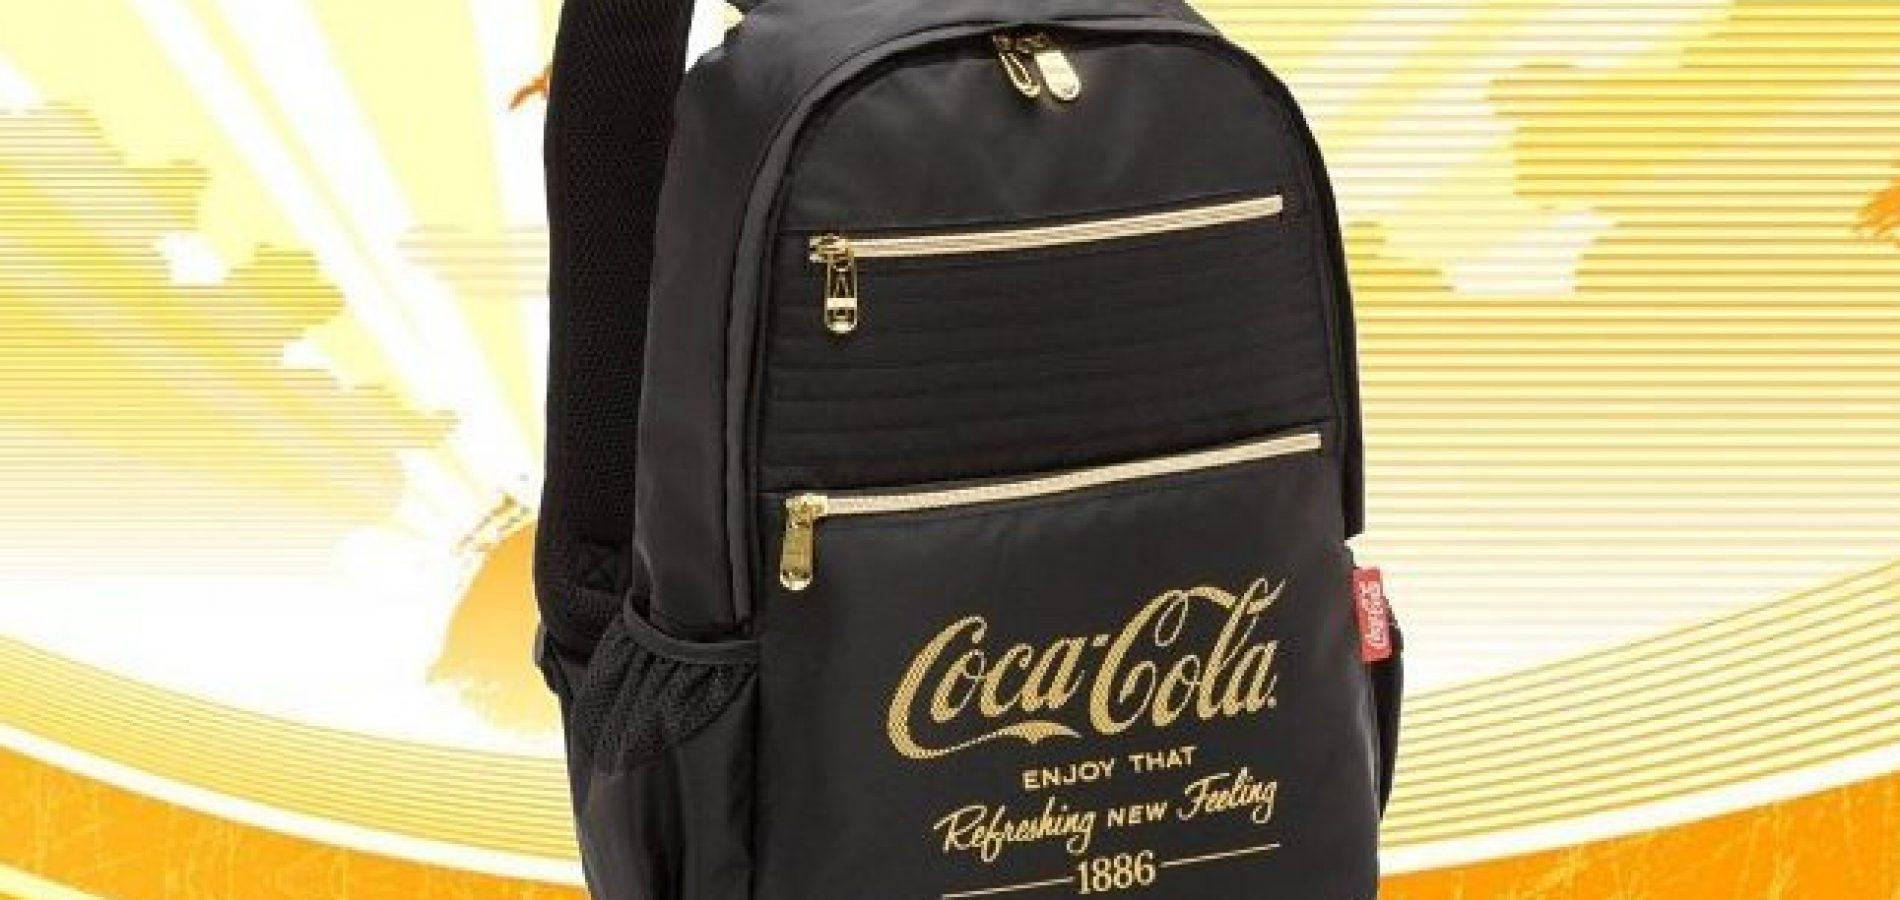 ARARIPINA | Loja Class Moda promove bazar com preços incríveis. Confira!